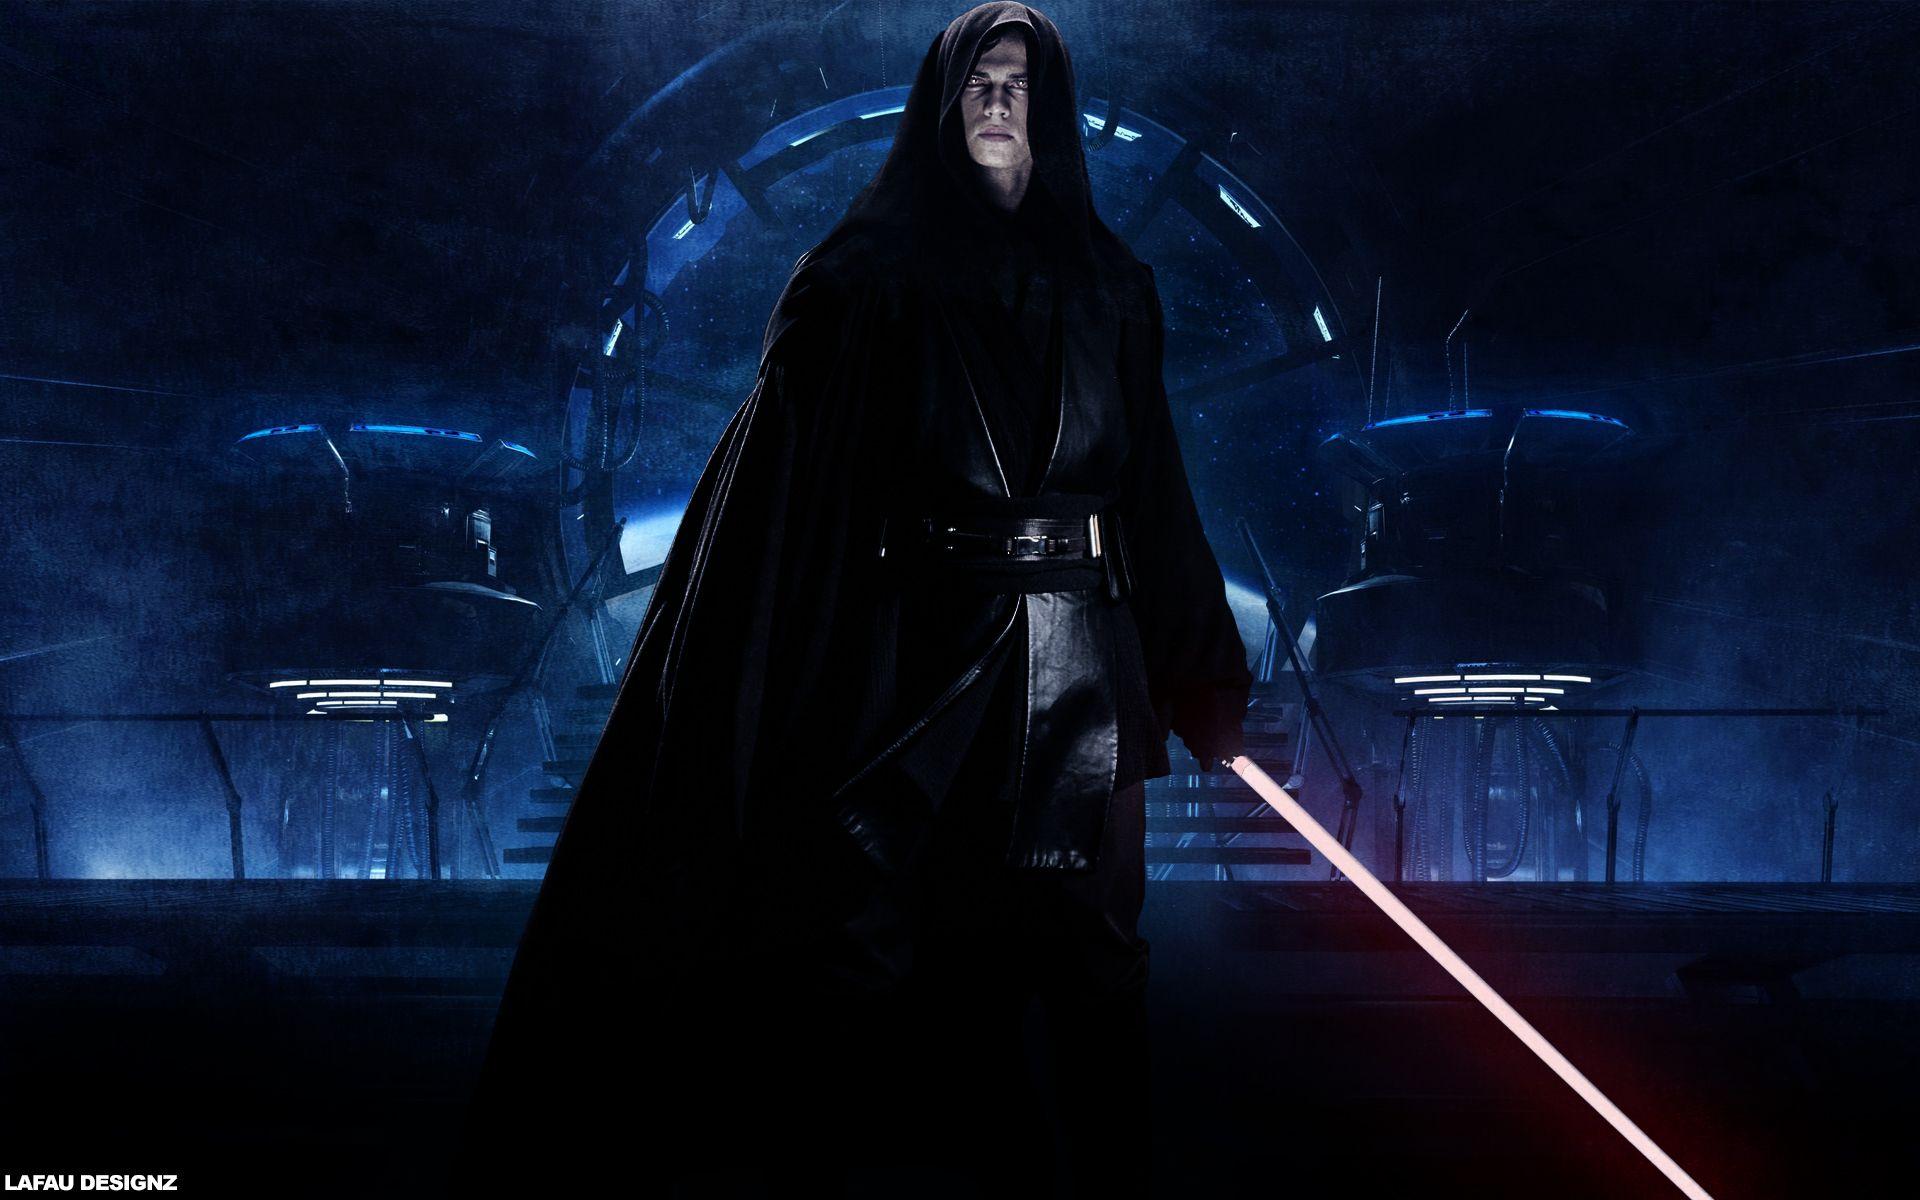 Anakin Skywalker Star Wars Wallpaper By Lafaudesignz D5v45vf Jpg 1920 1200 Anakin Skywalker Star Wars Watch Sith